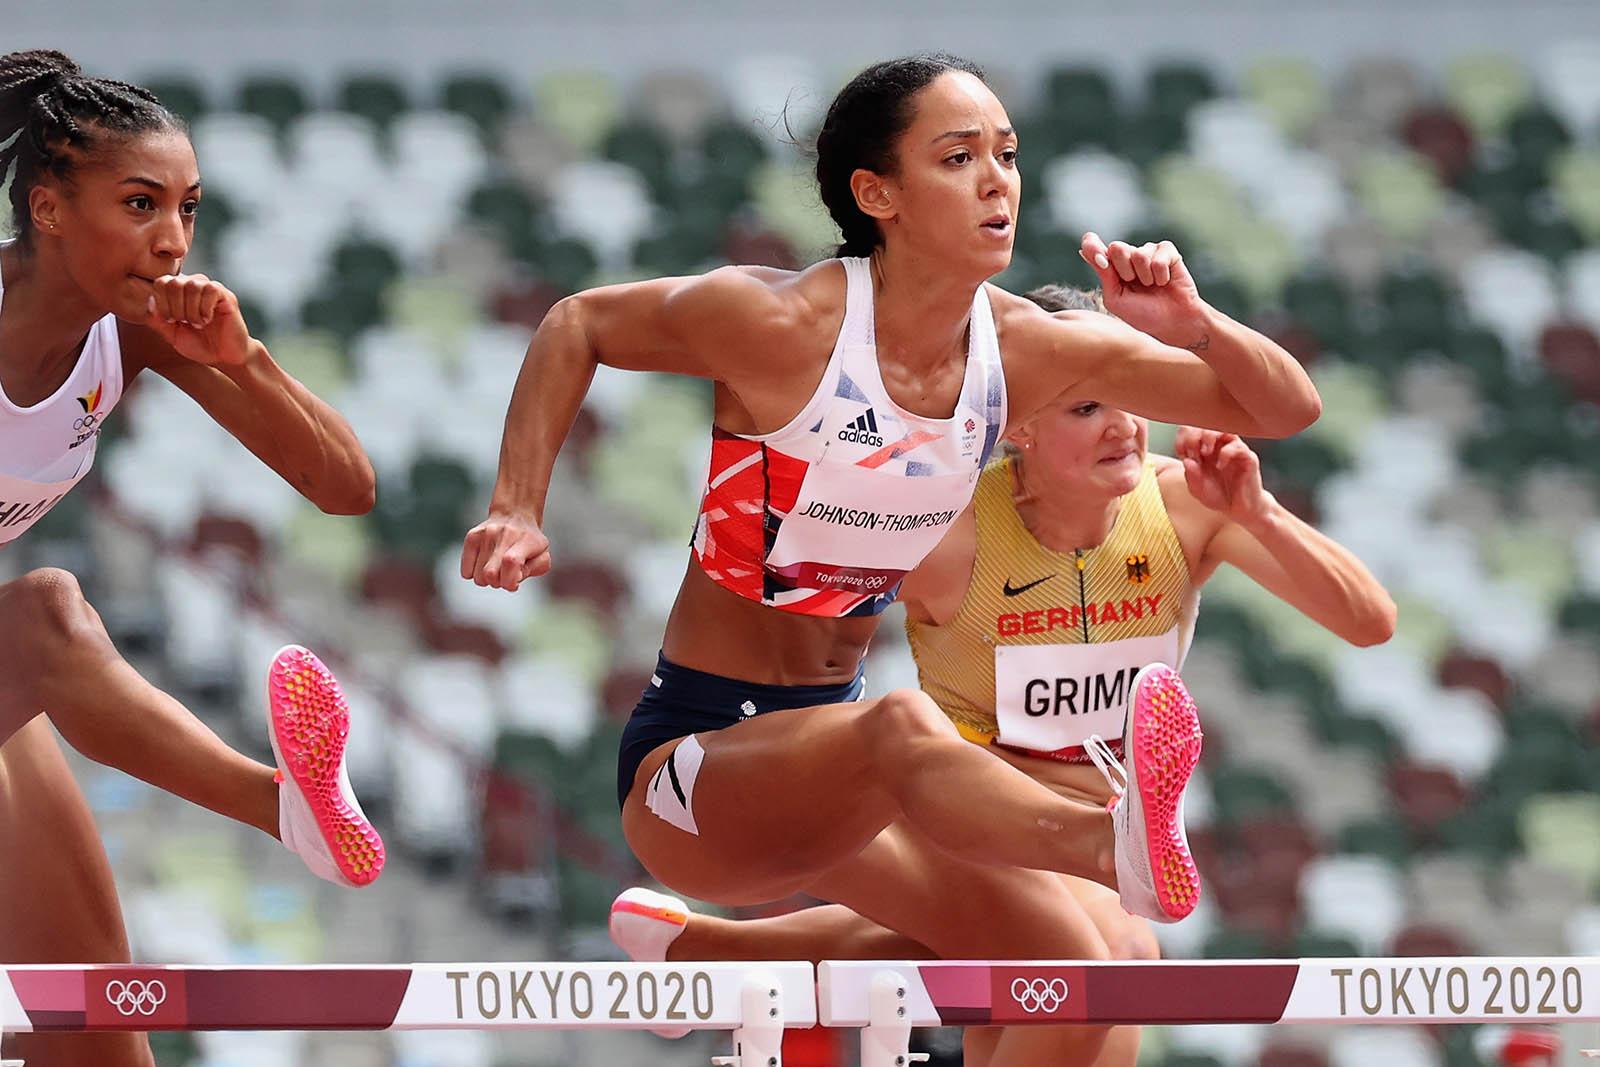 Johnson-Thompson, center, competes in the women's heptathlon 100m hurdles on Wednesday.